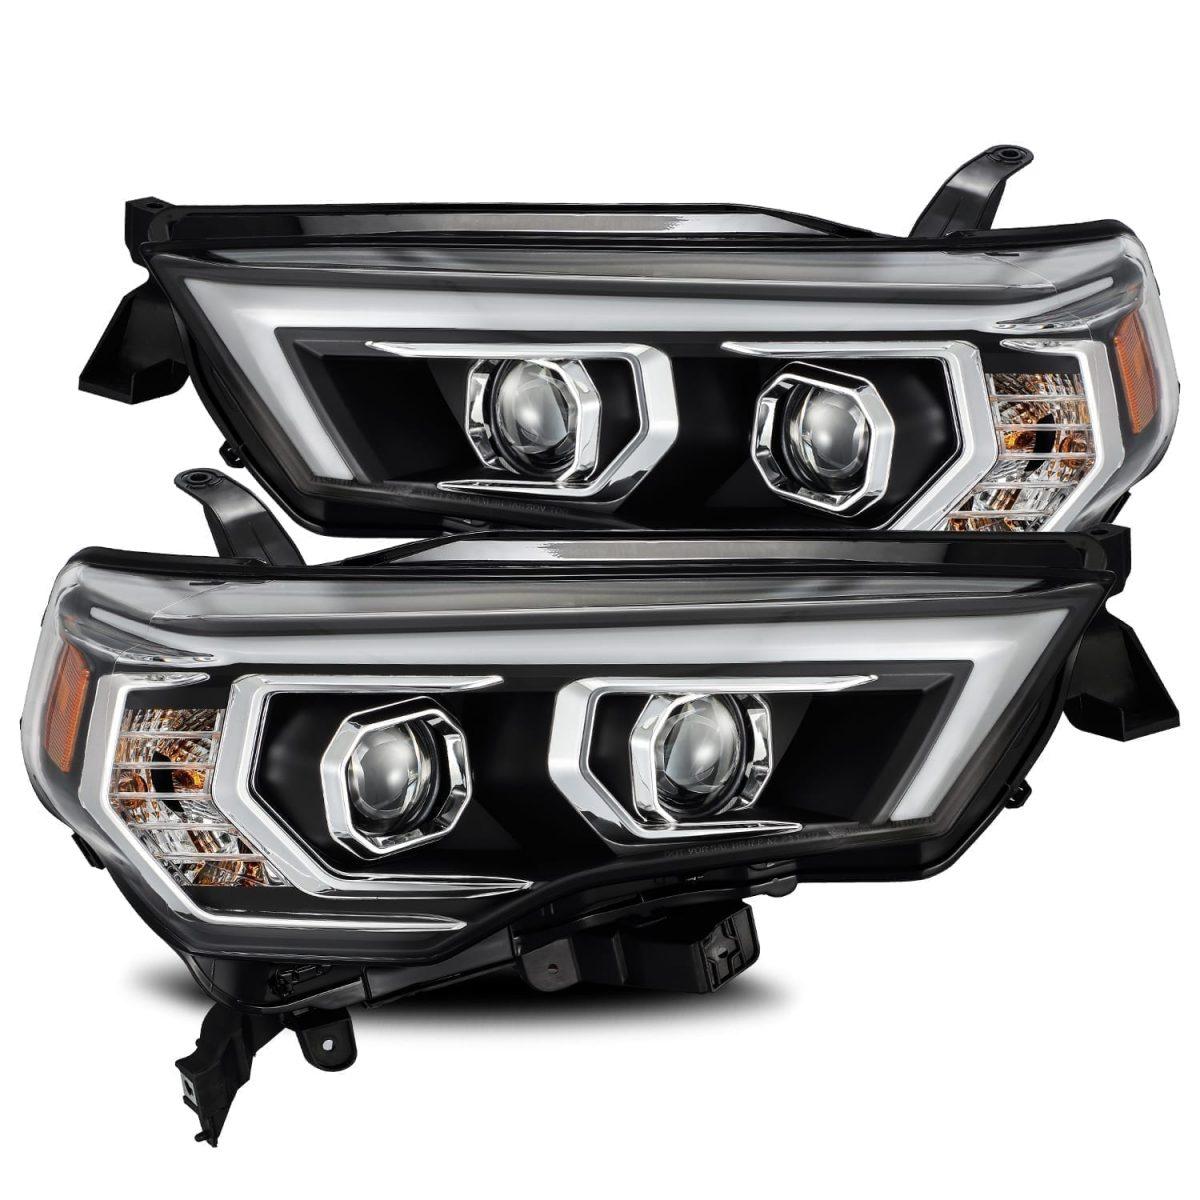 2014 2015 2016 2017 2018 2019 2020 Toyota 4Runner PRO-Series Projector Headlights Black